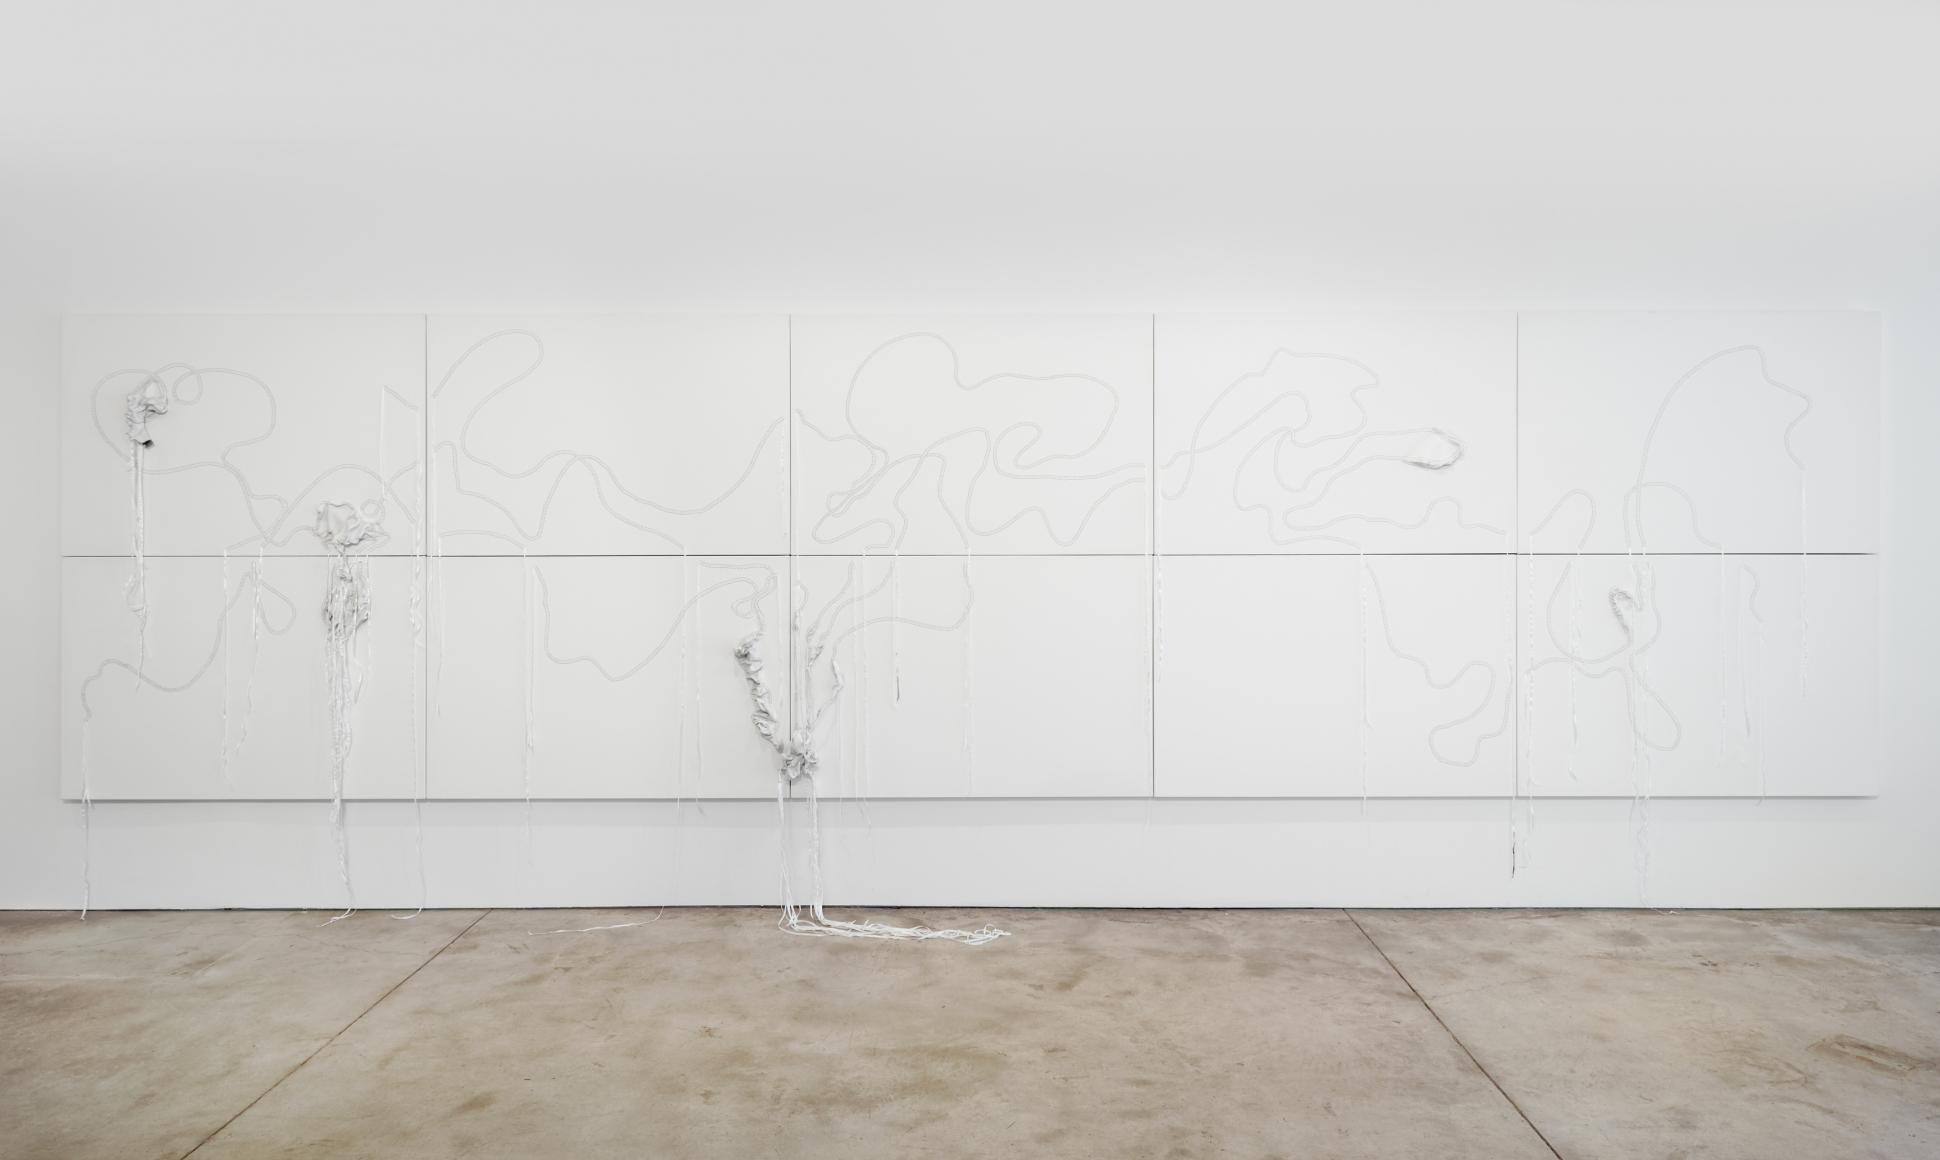 Nicholas Hlobo, Ulwamkelo installation view 2